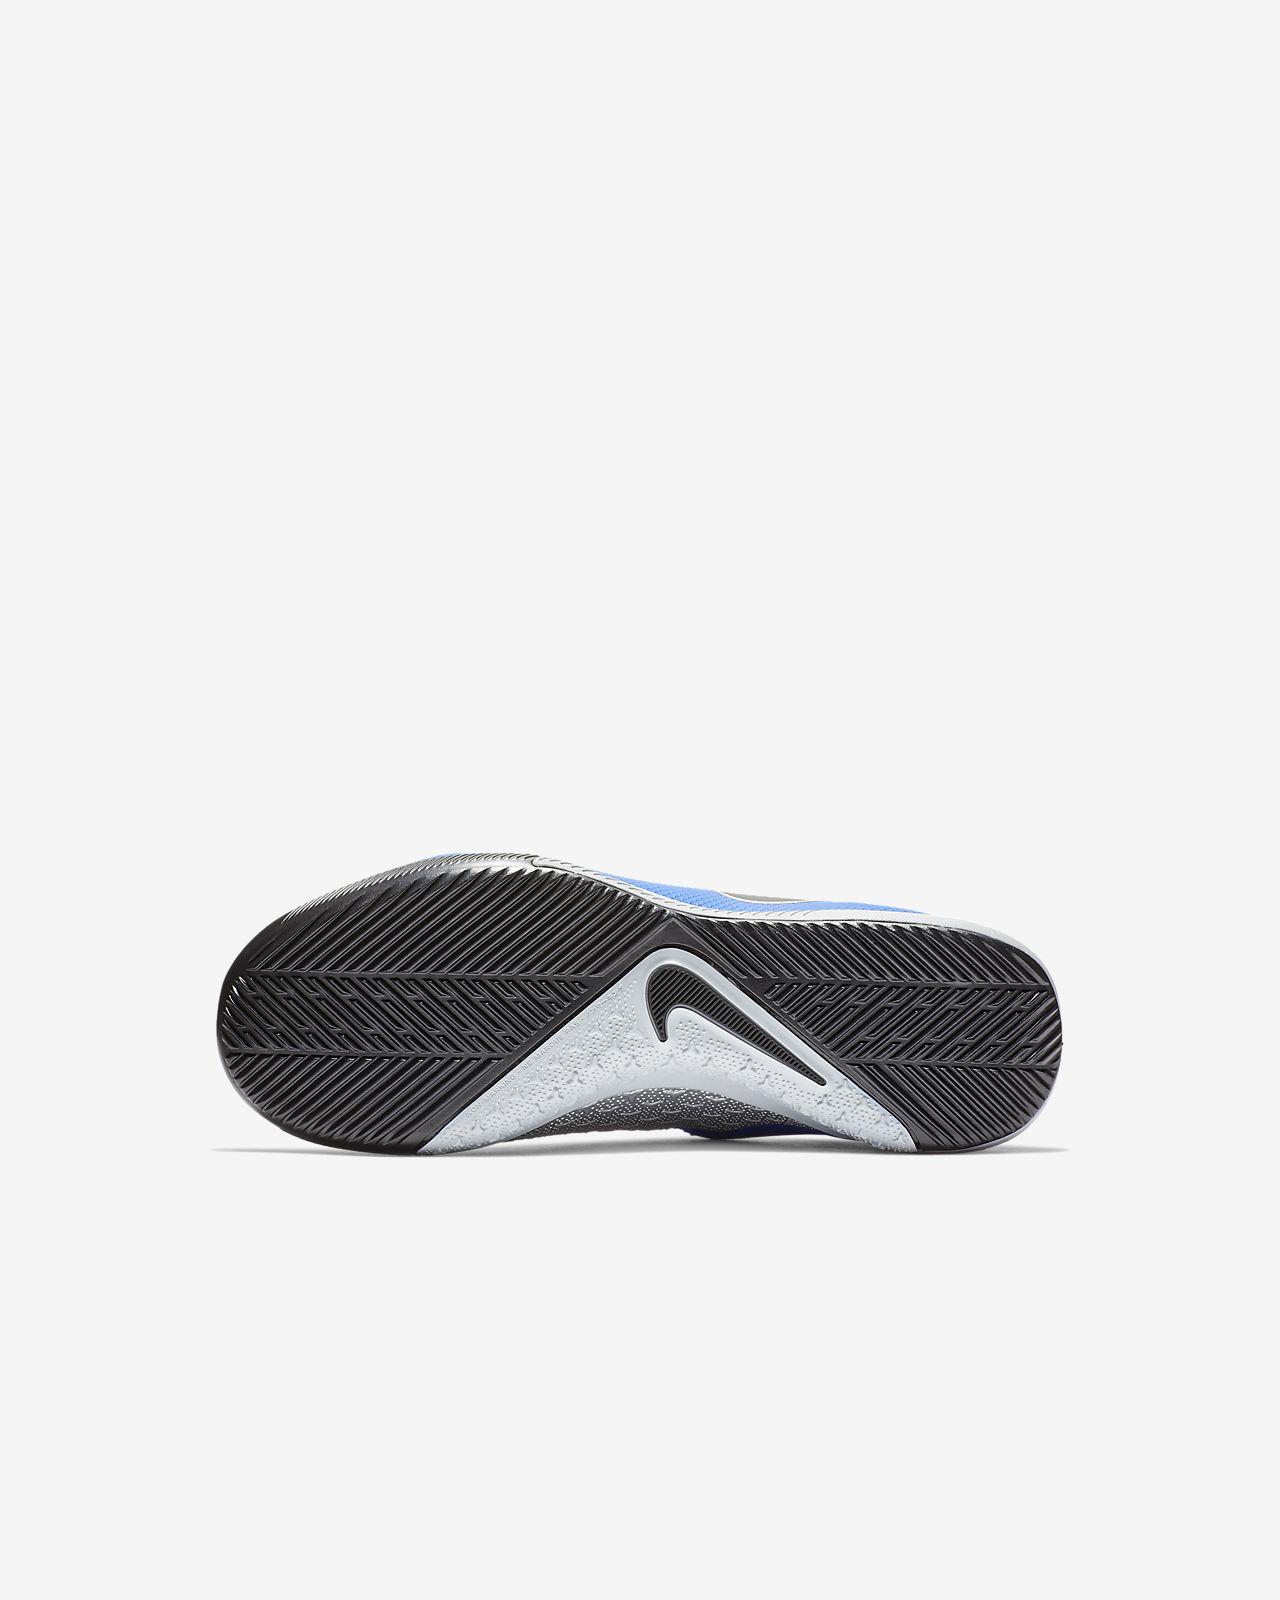 16b4b4534 ... Nike Jr. Phantom Vision Academy Dynamic Fit IC Kids  Indoor Court  Football Boot